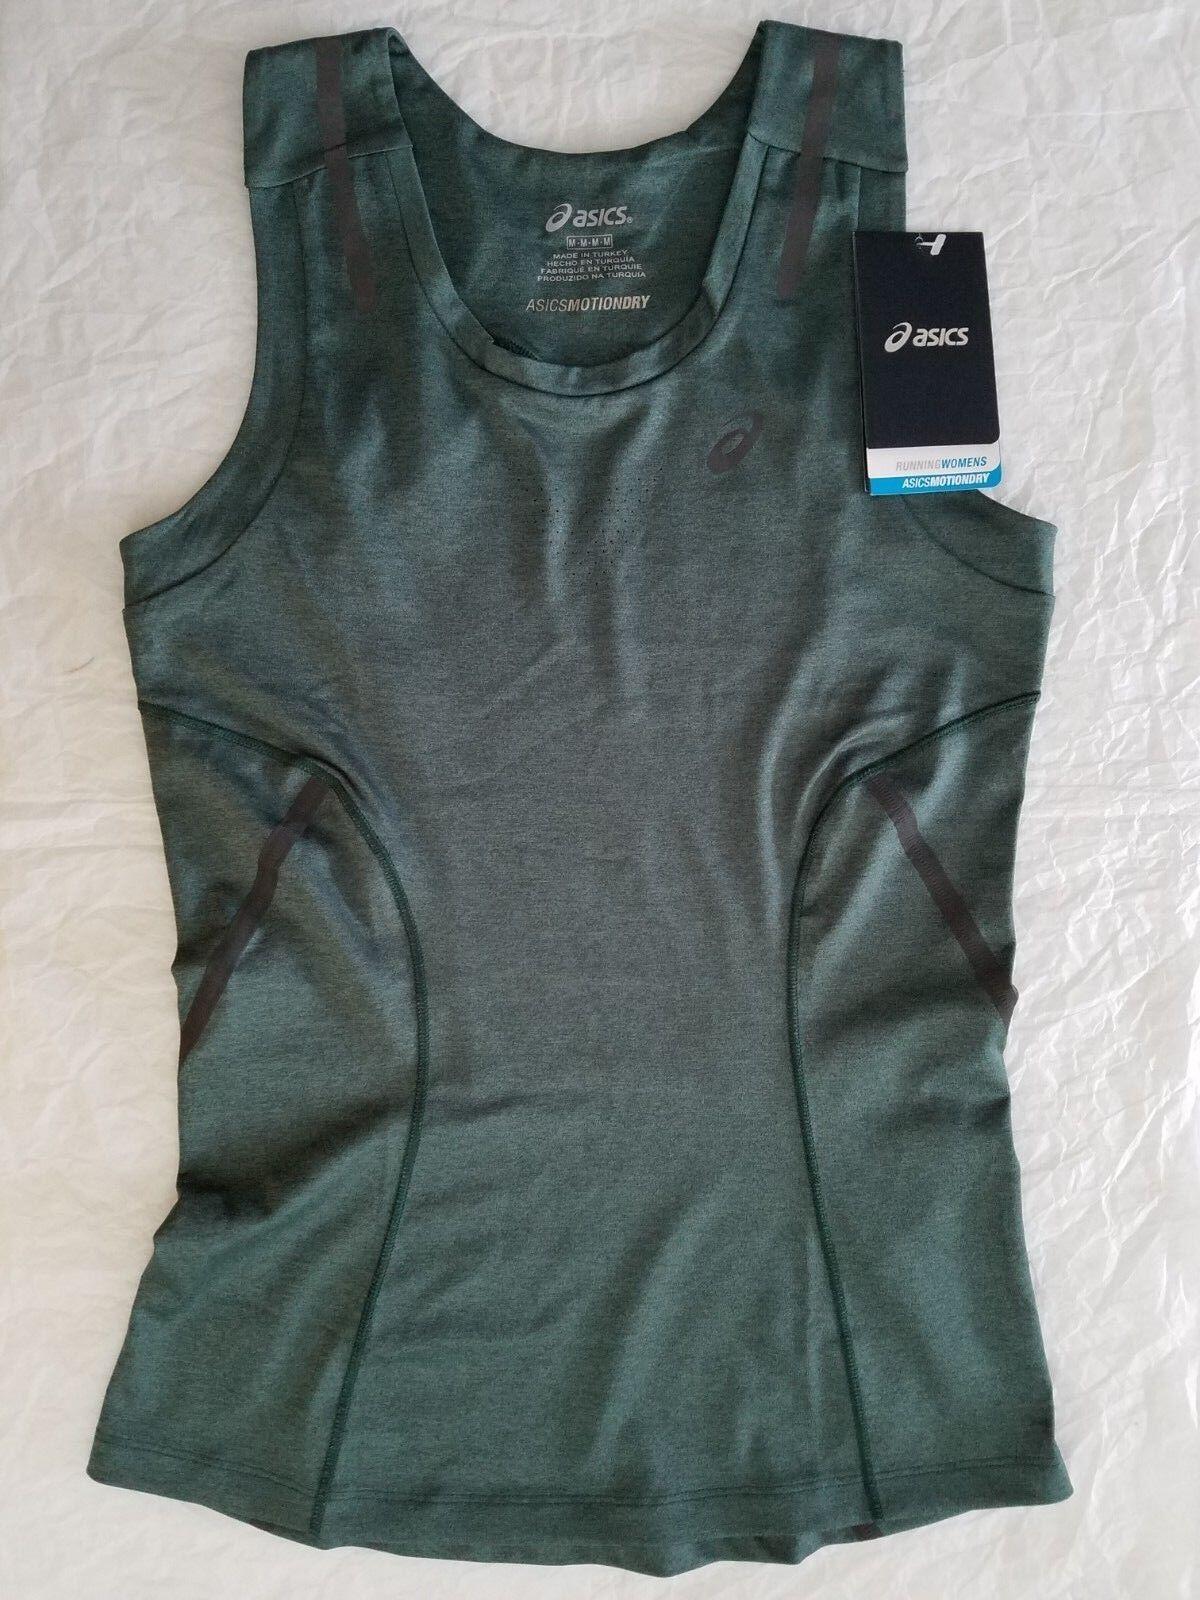 Women's asics Tank Top Vest Running Jogging Fitness Top Green - M M, XS TP